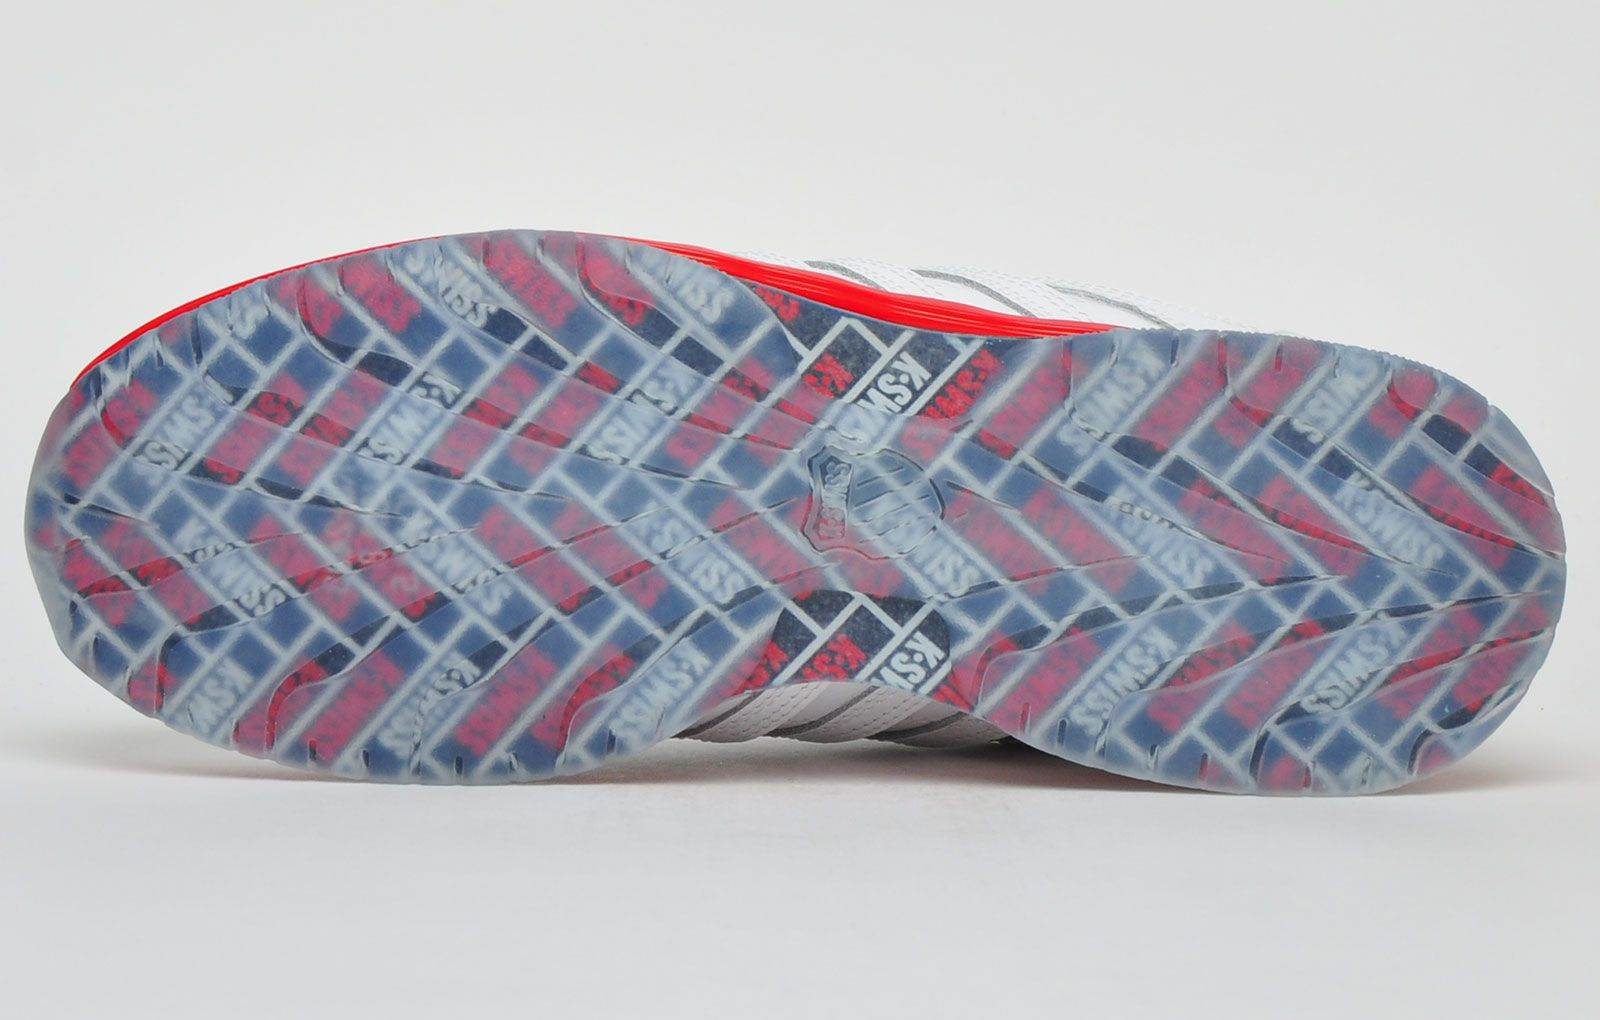 K Swiss Rinzler SP Limited Edition Mens